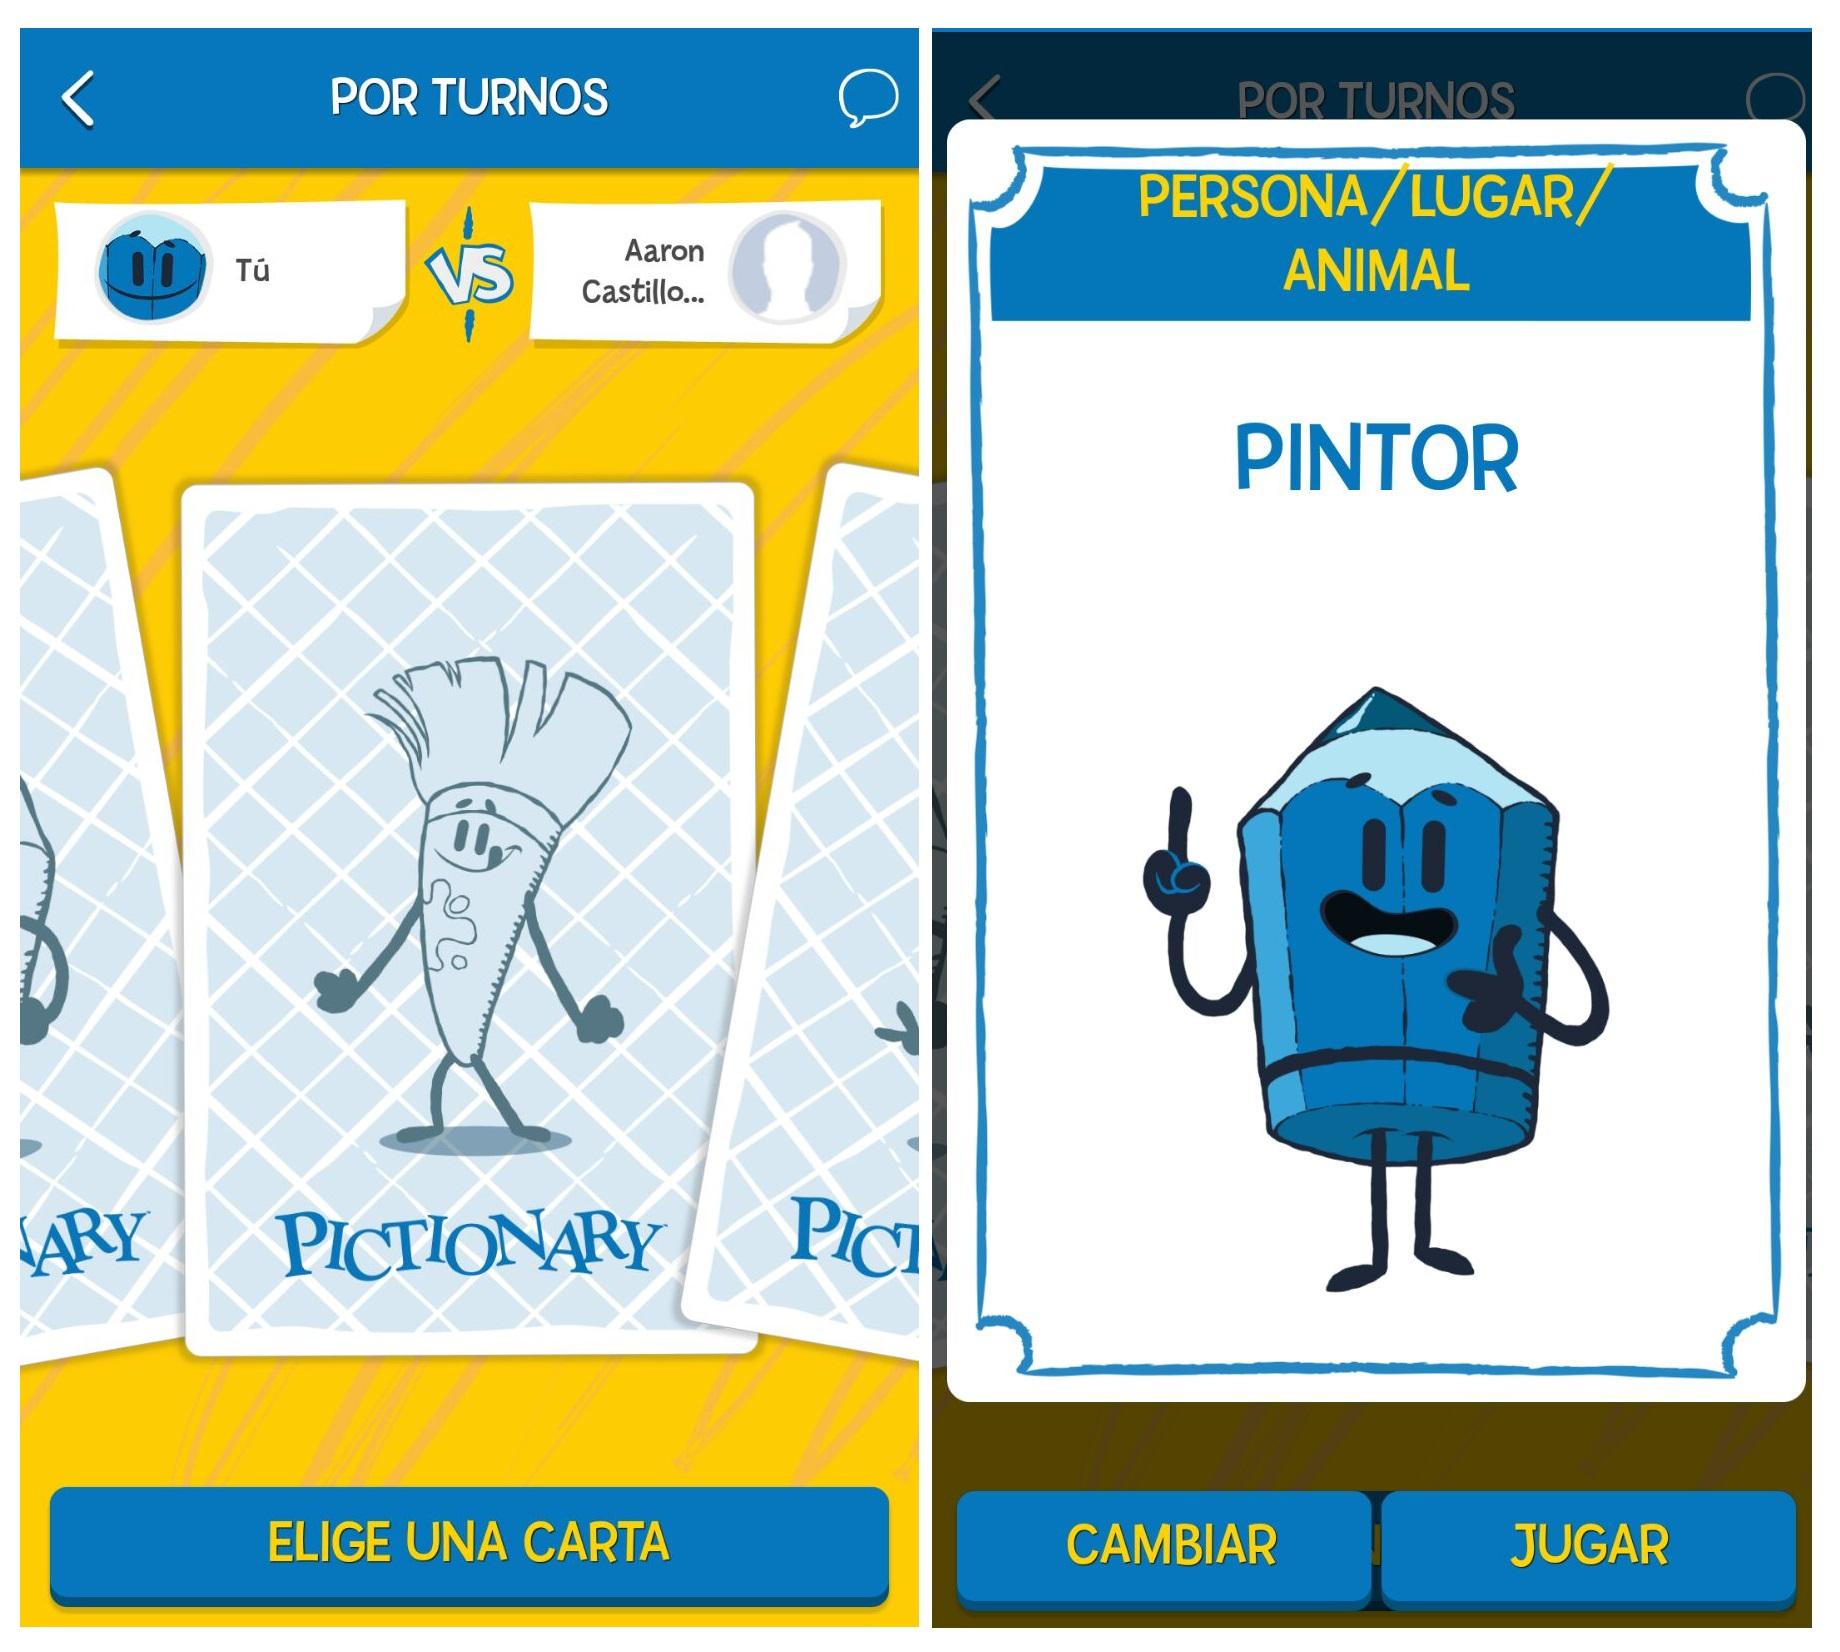 Pictionary App